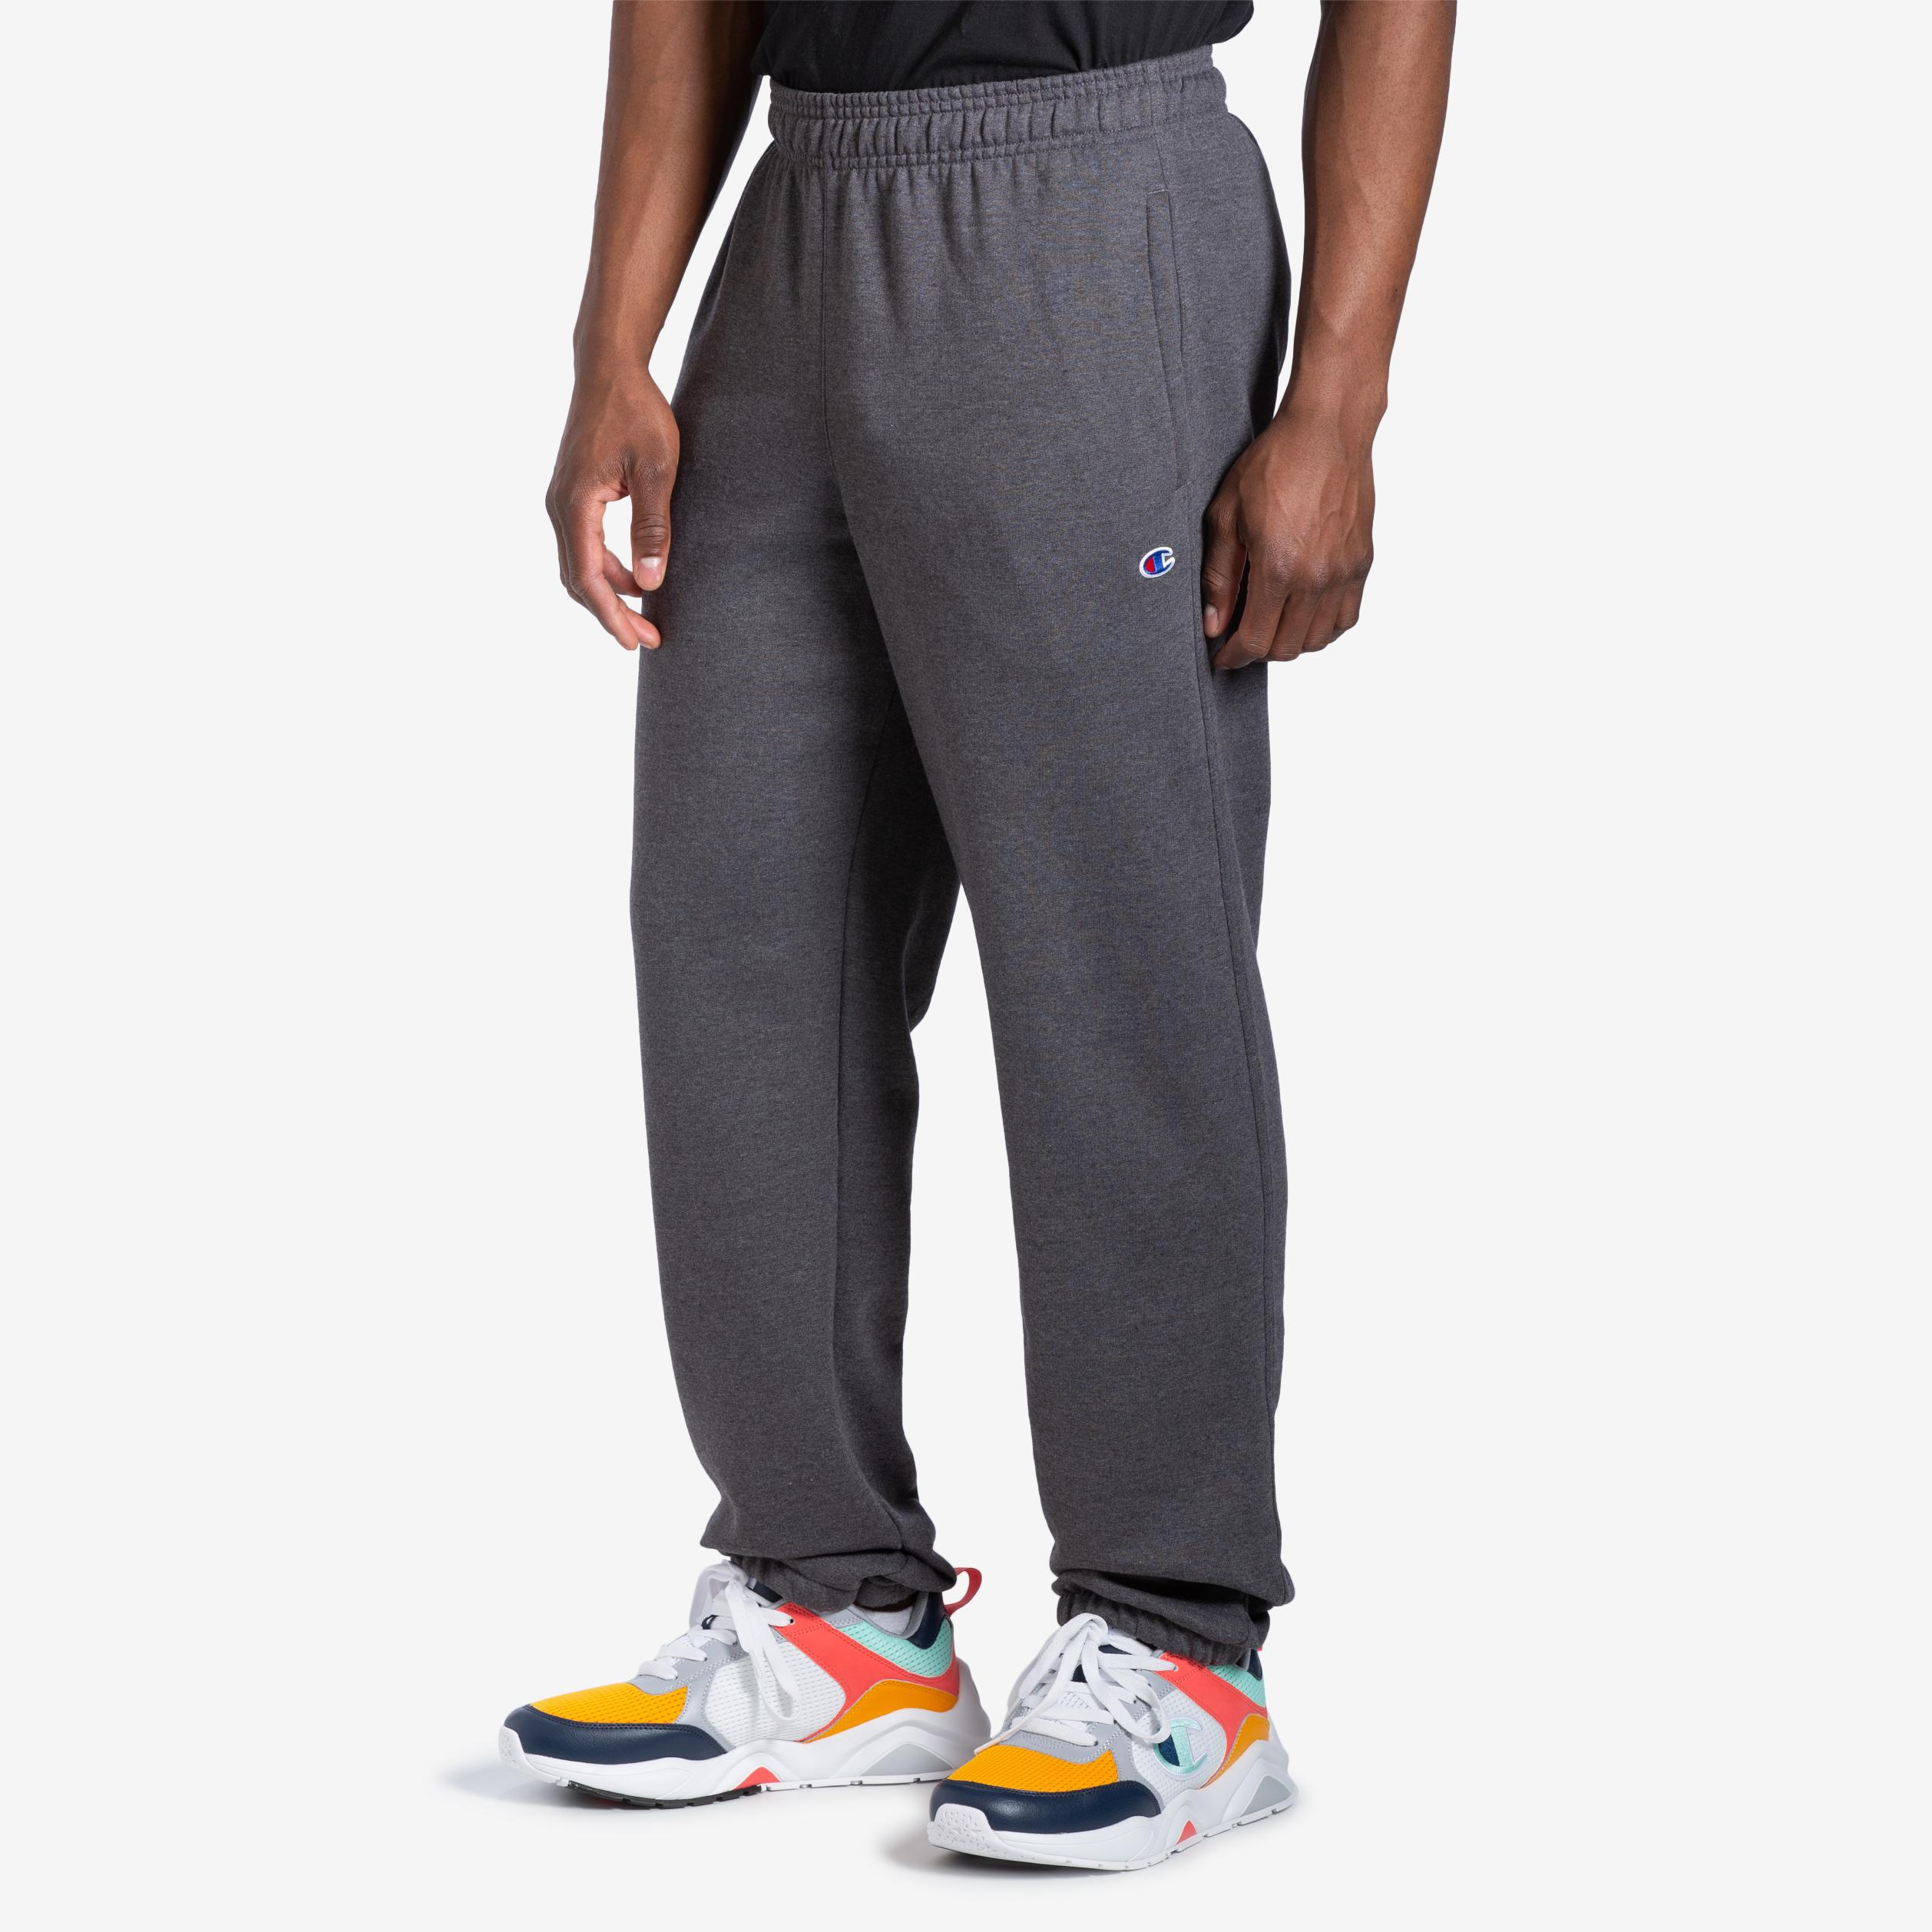 Powerblend Sweats Relaxed Bottom Pants